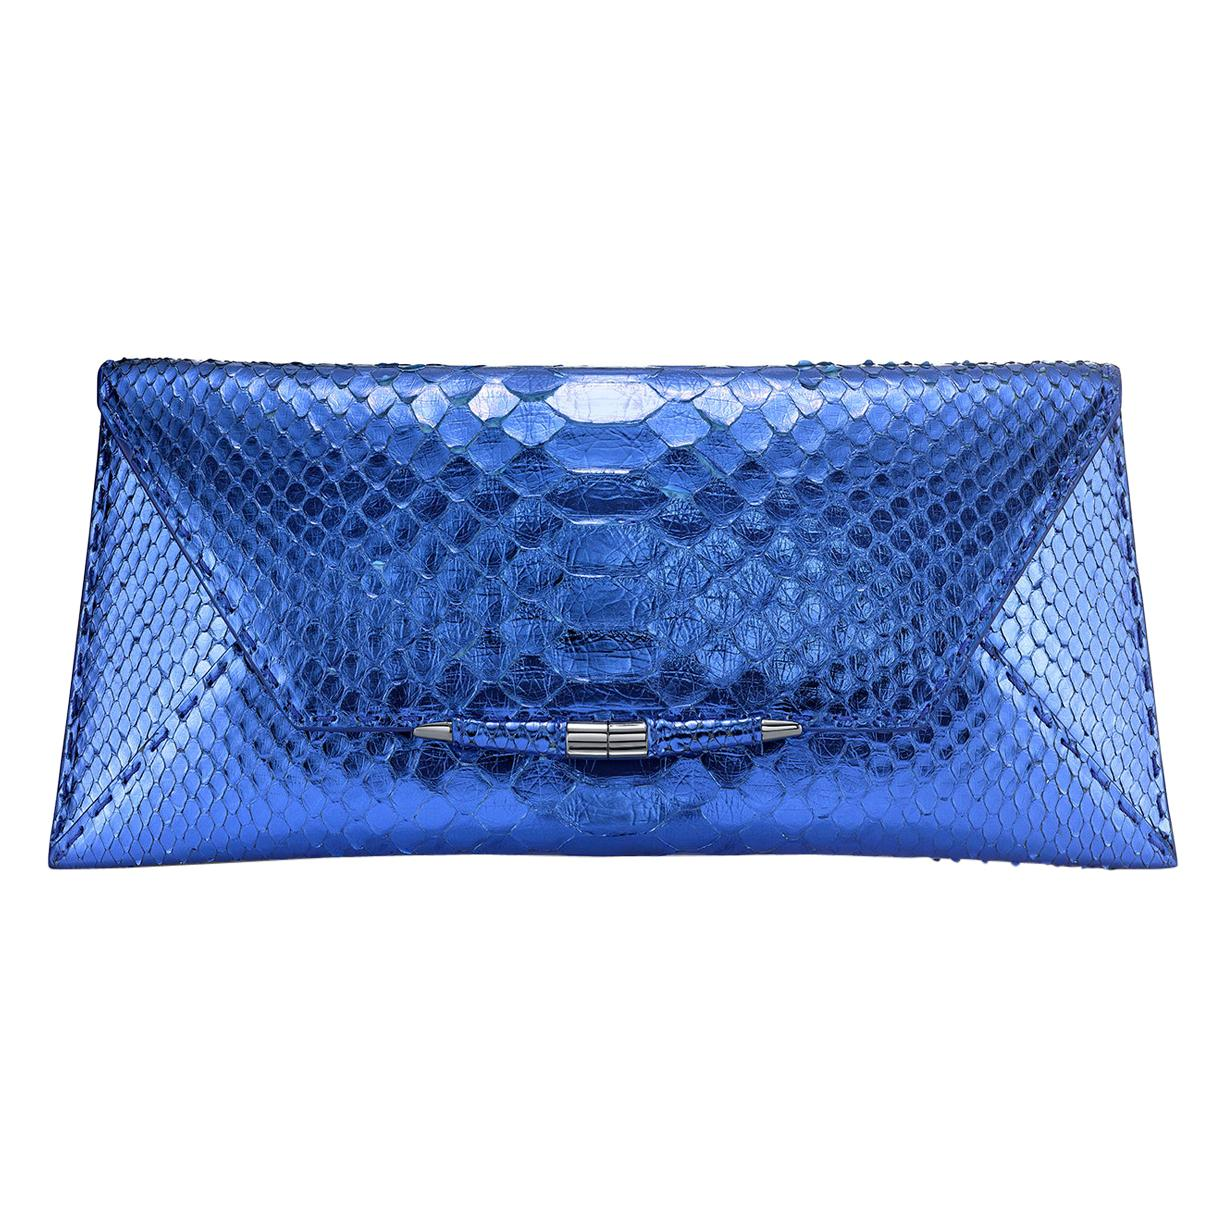 TYLER ELLIS Aimee Clutch Large Metallic Blue Python Gunmetal Hardware